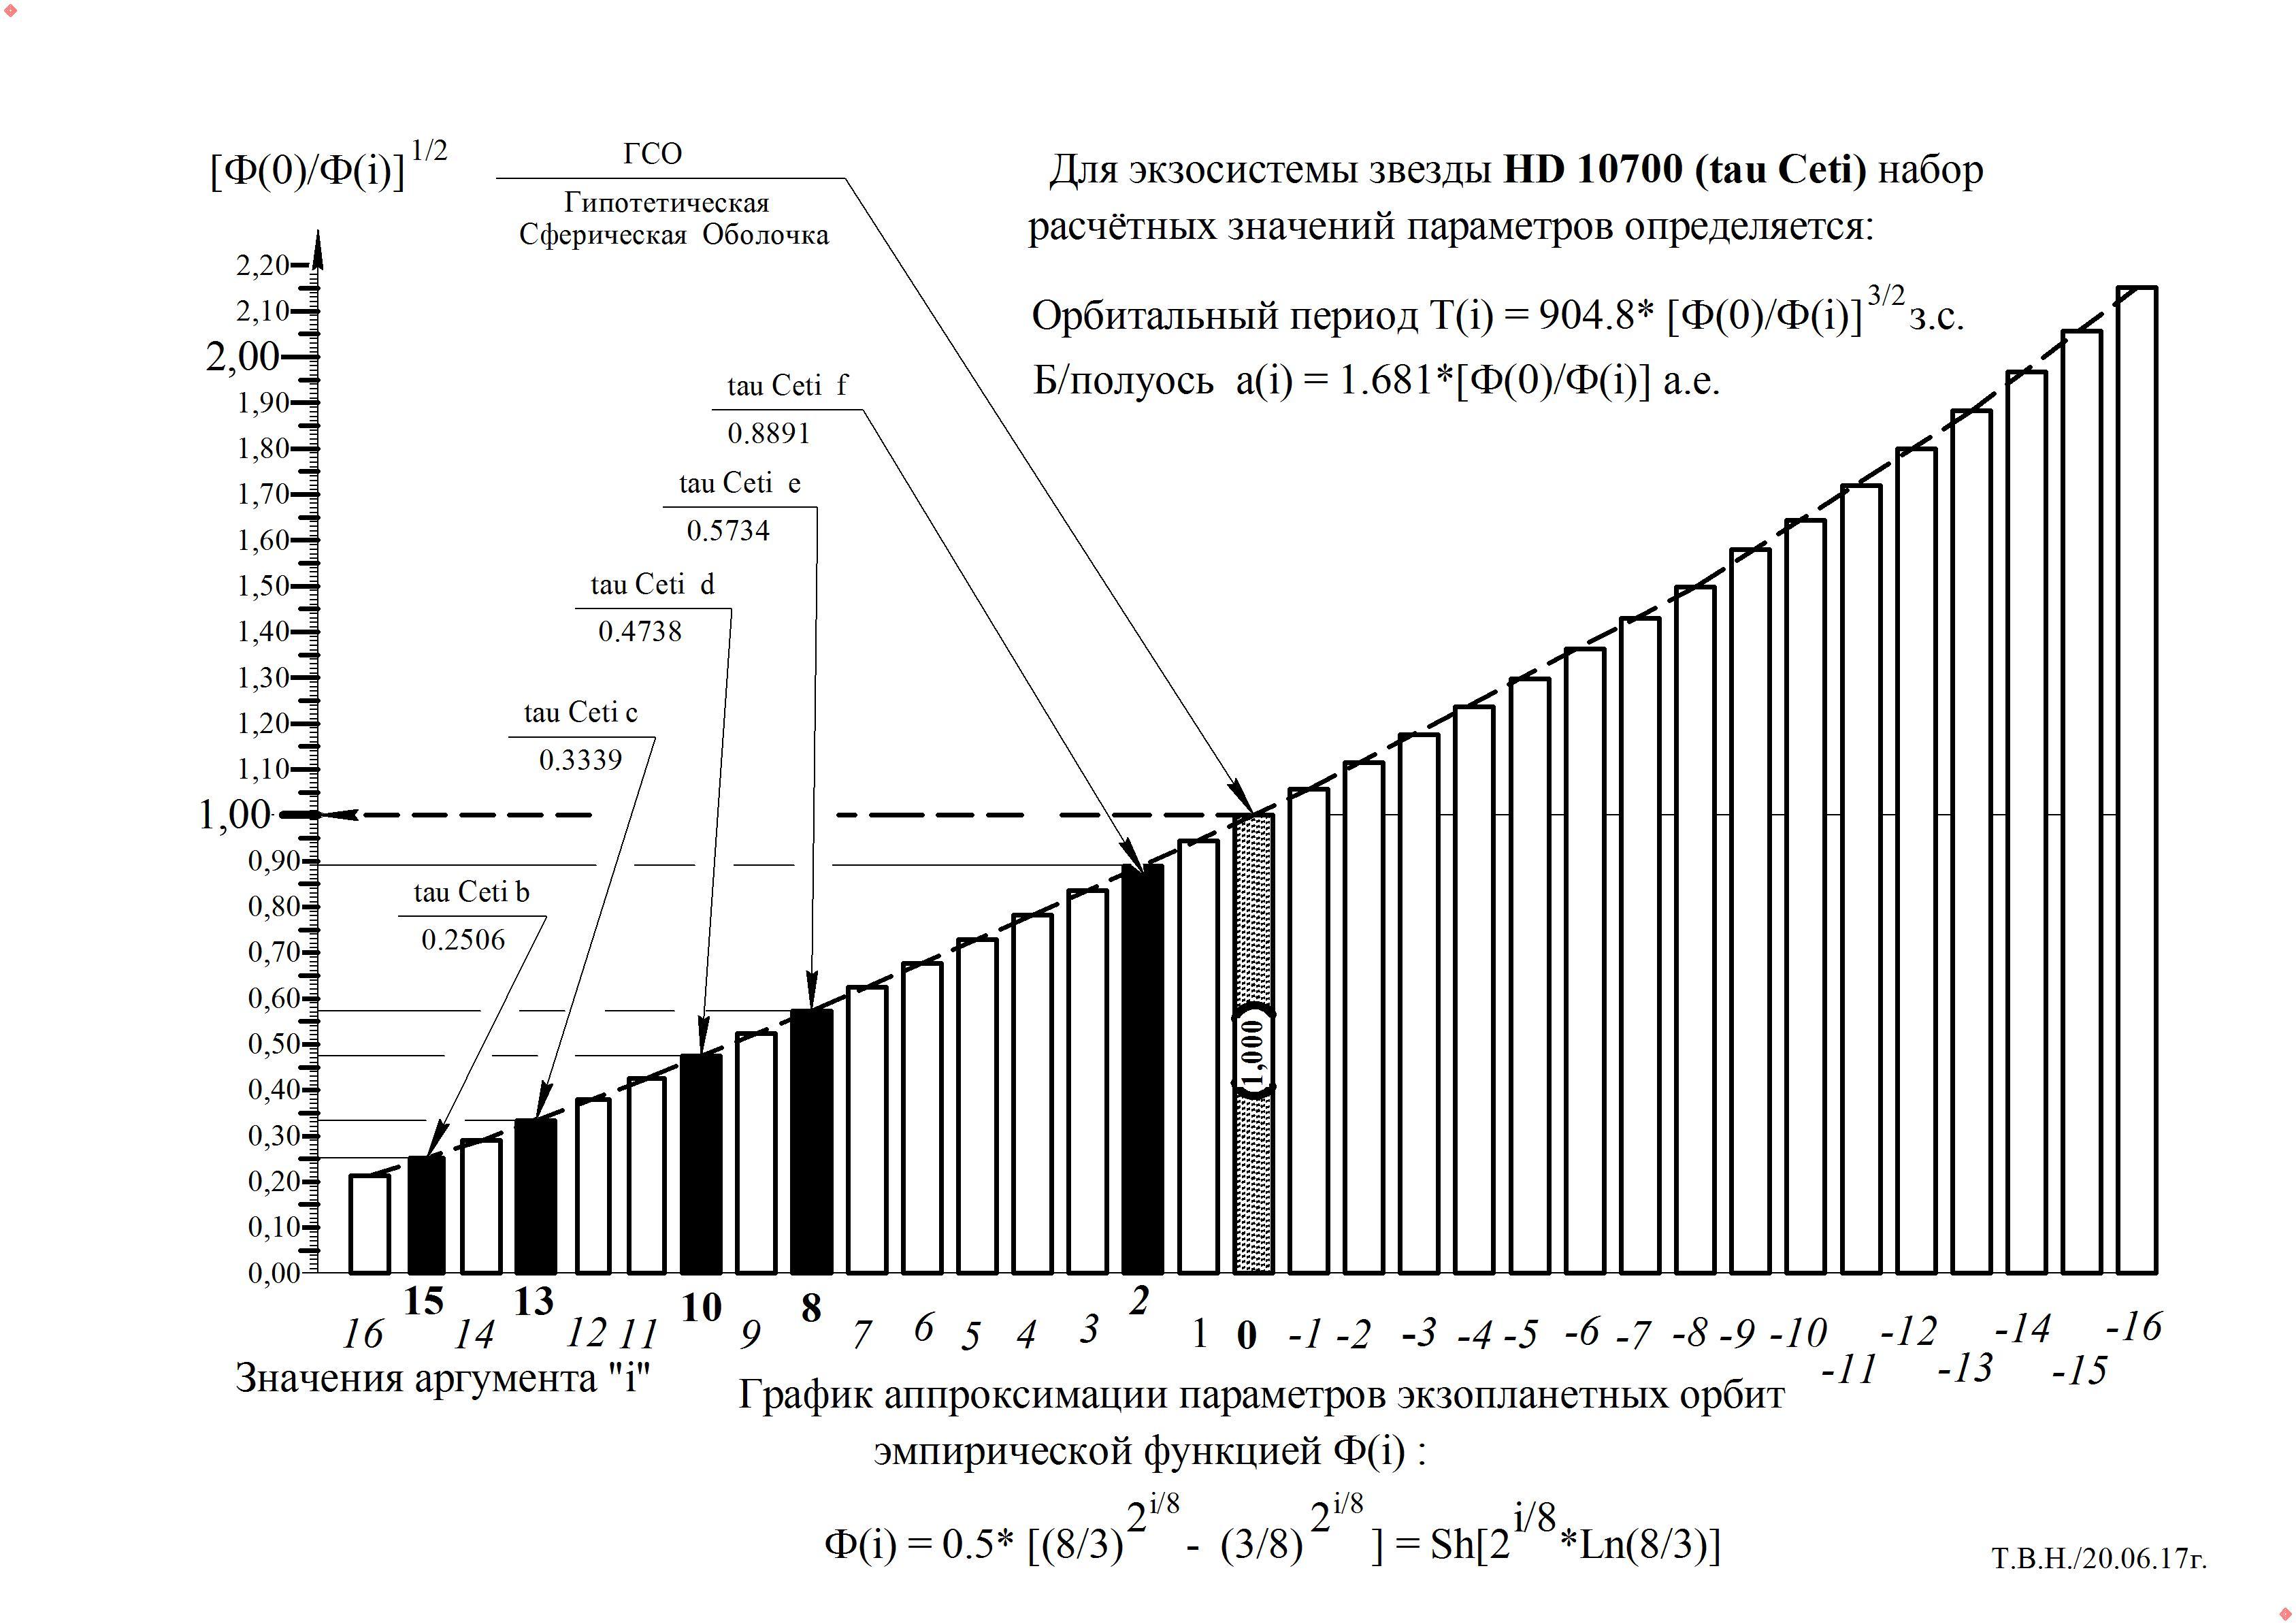 График -HD 10700 (tau ceti).jpg